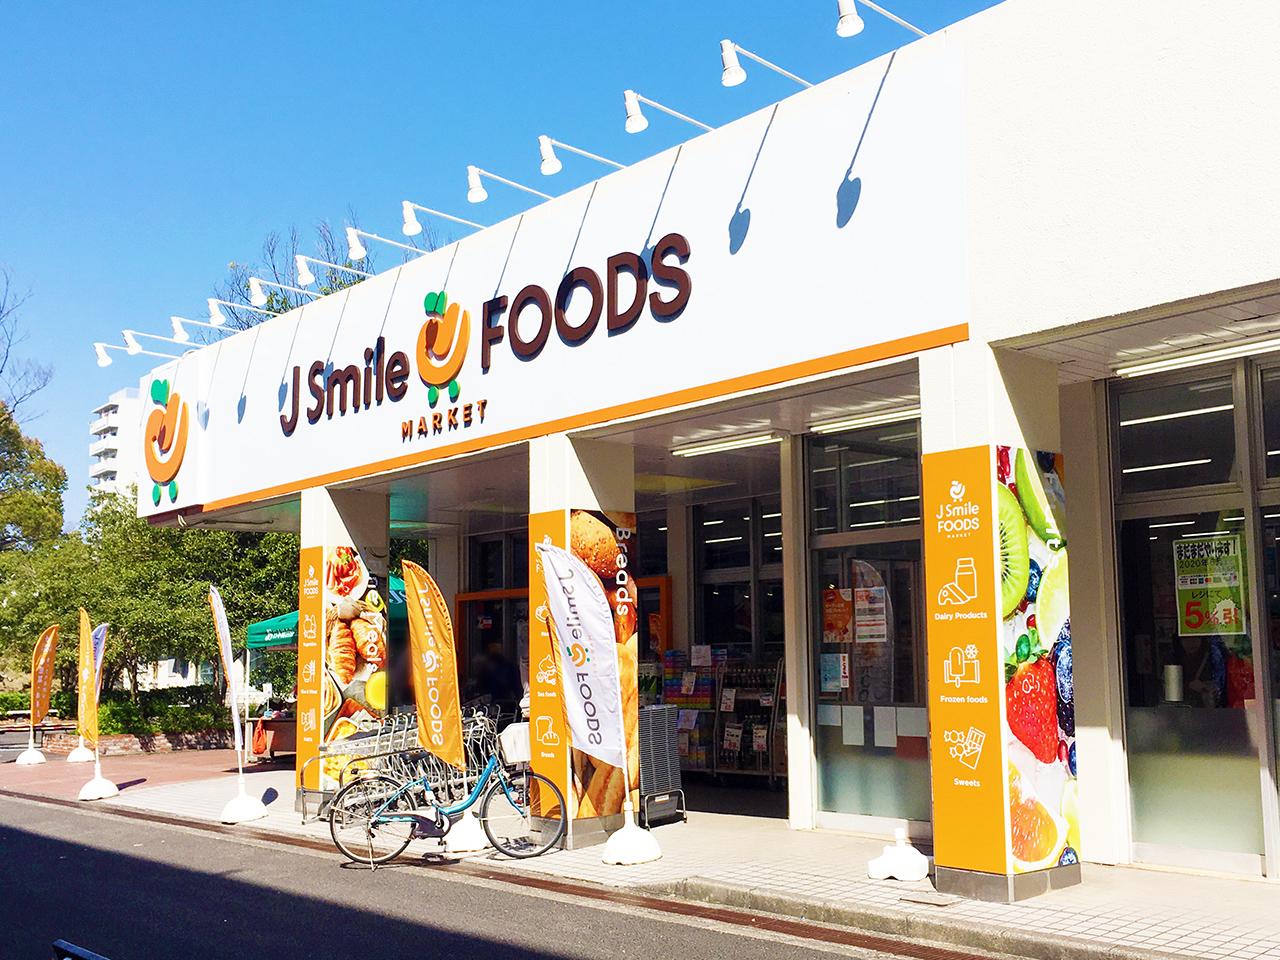 J Smile FOODS MARKET多摩ニュータウン貝取団地店がオープン